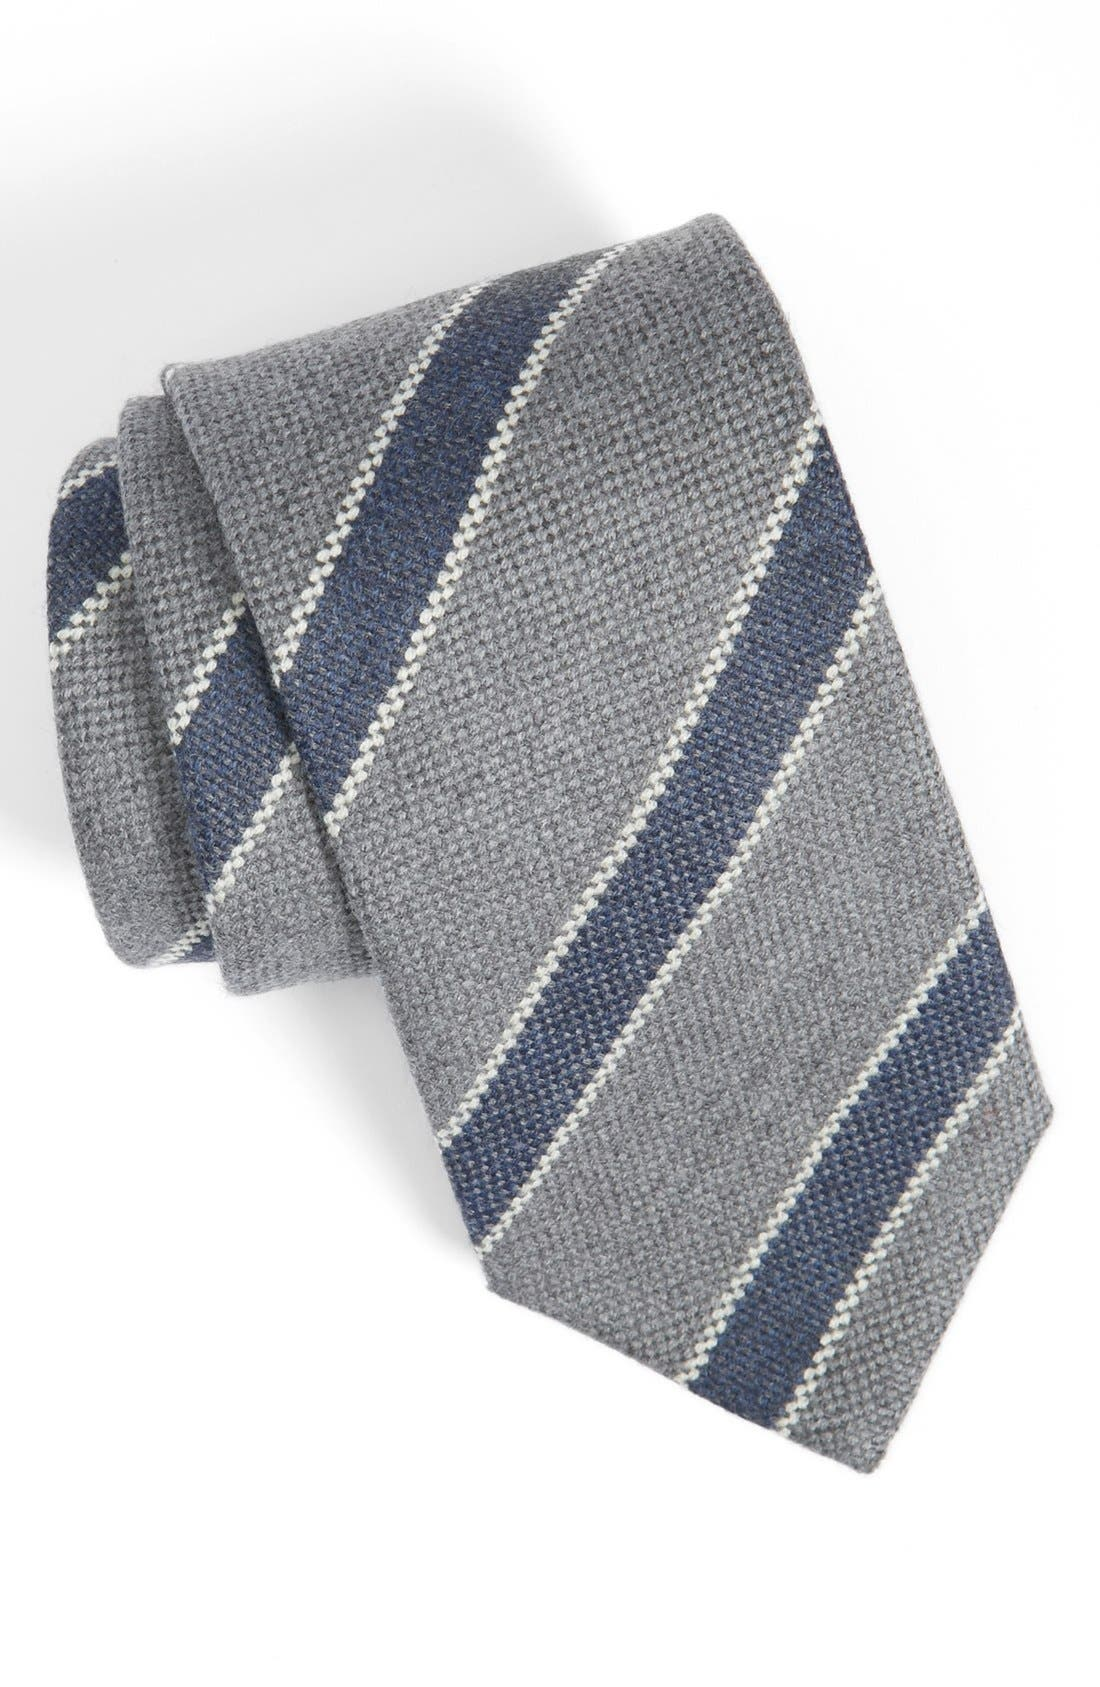 Main Image - Peter Millar Woven Wool Tie